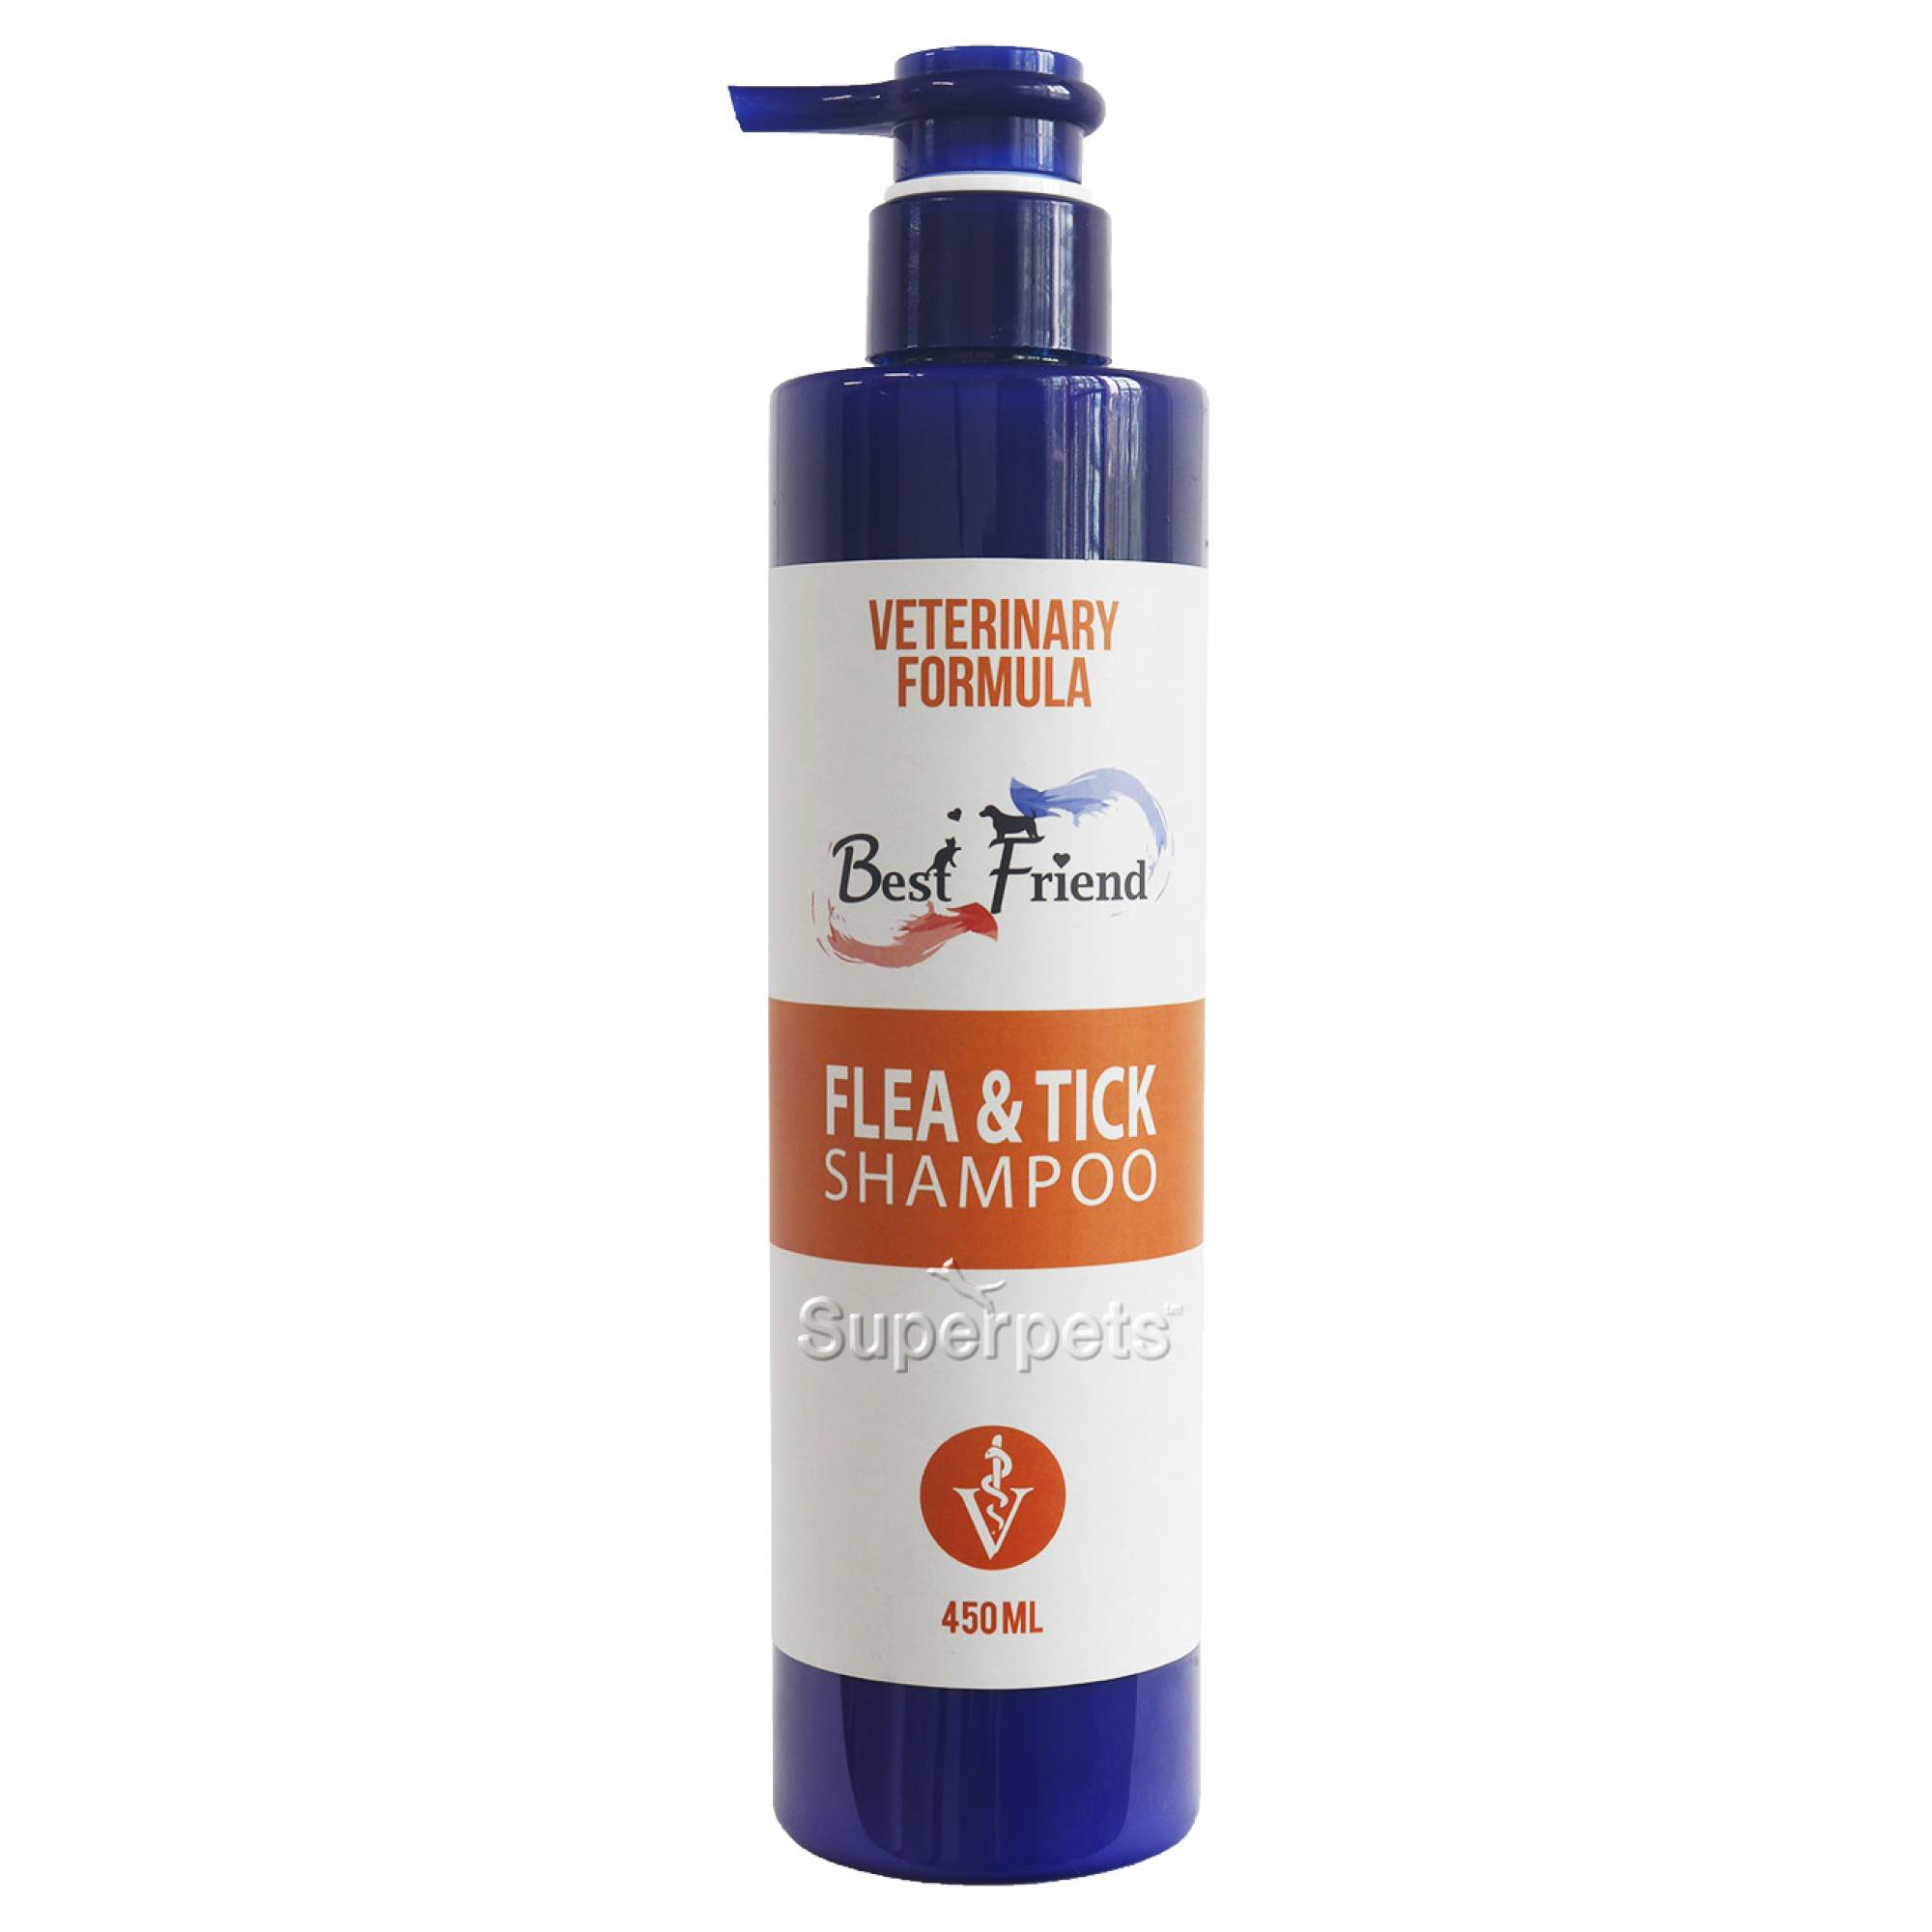 Best Friend Flea & Tick Shampoo 450ml